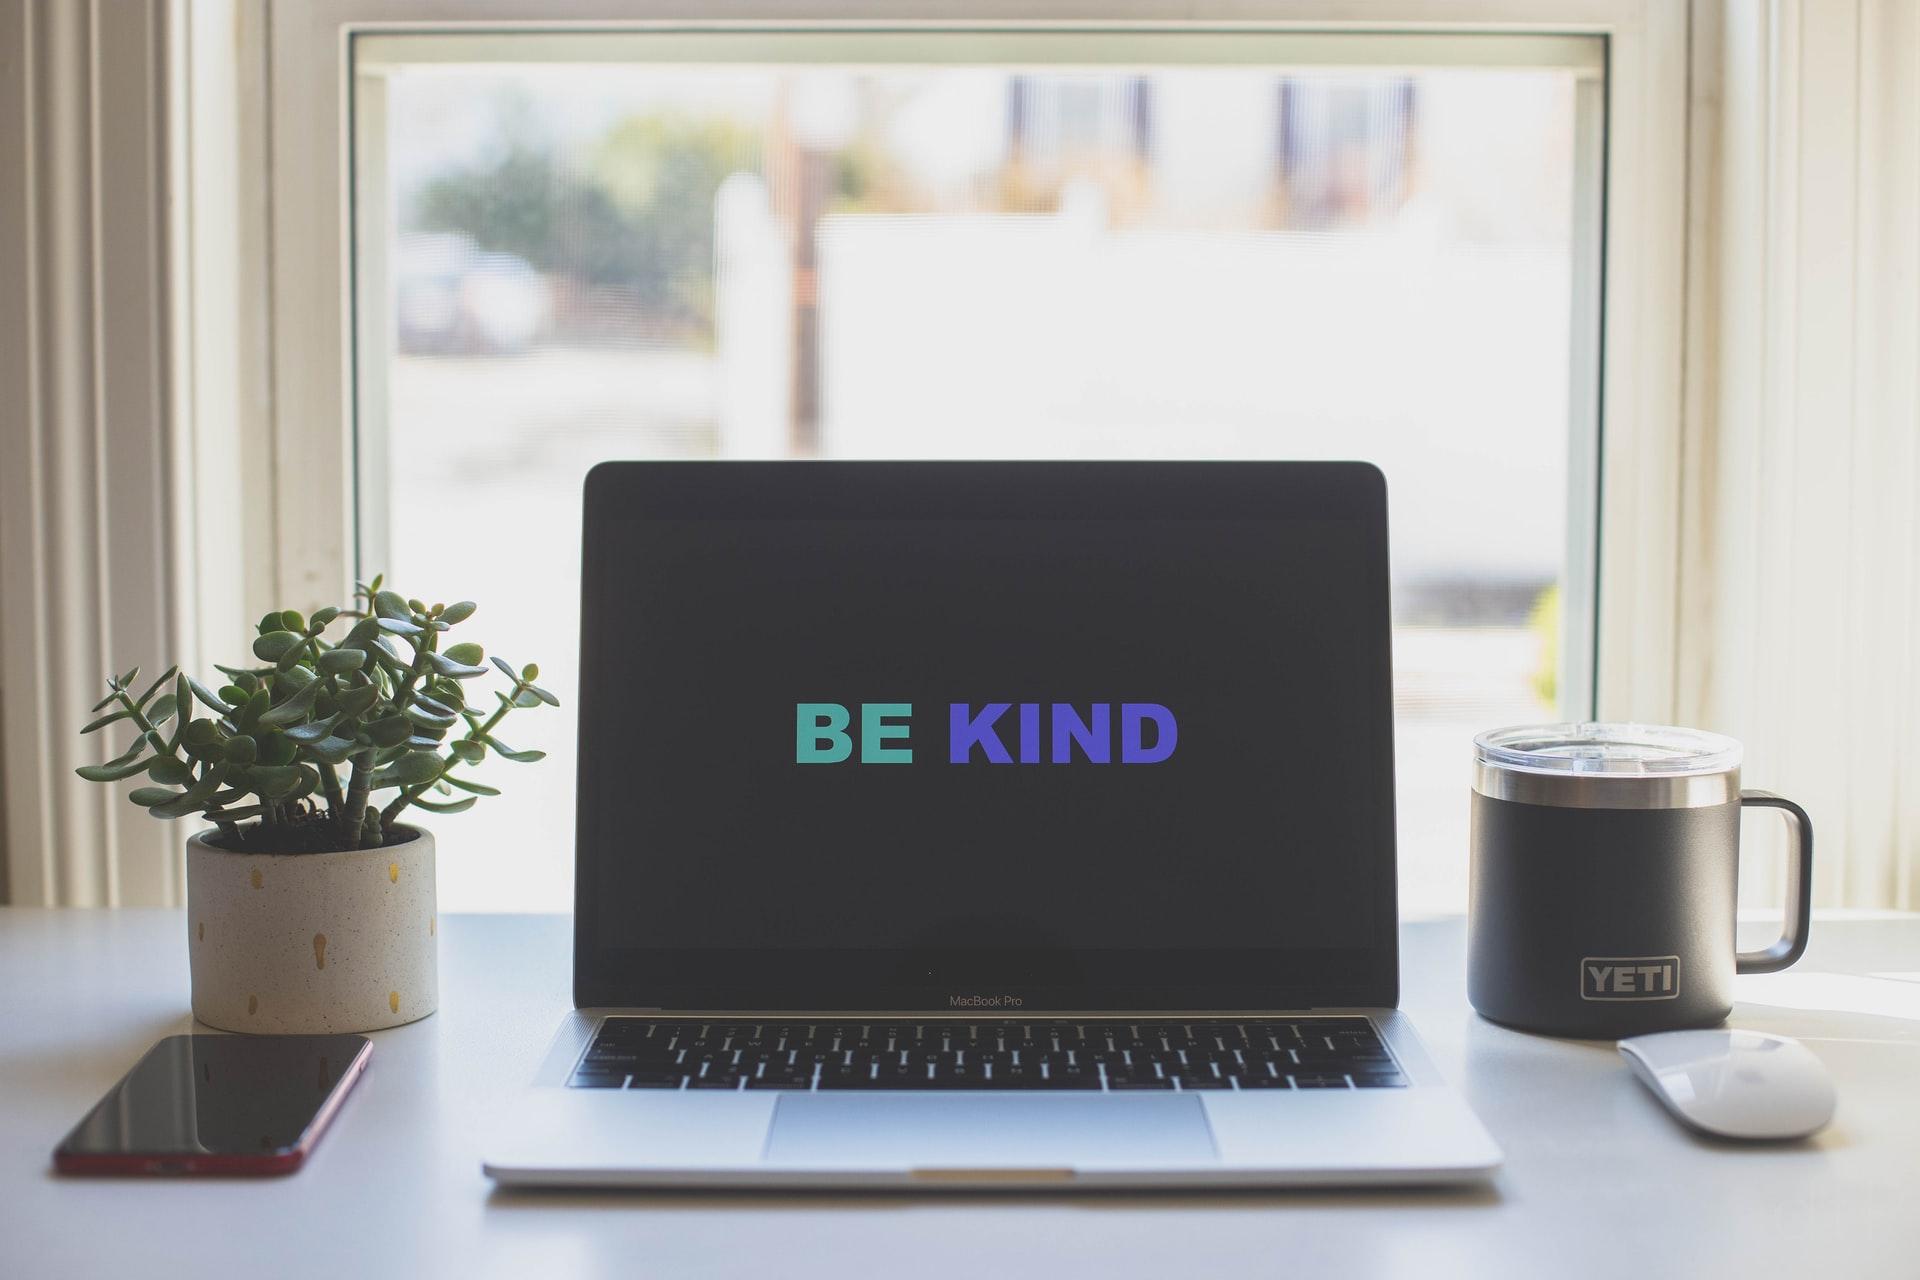 Summer Resources Week 1: Kindness